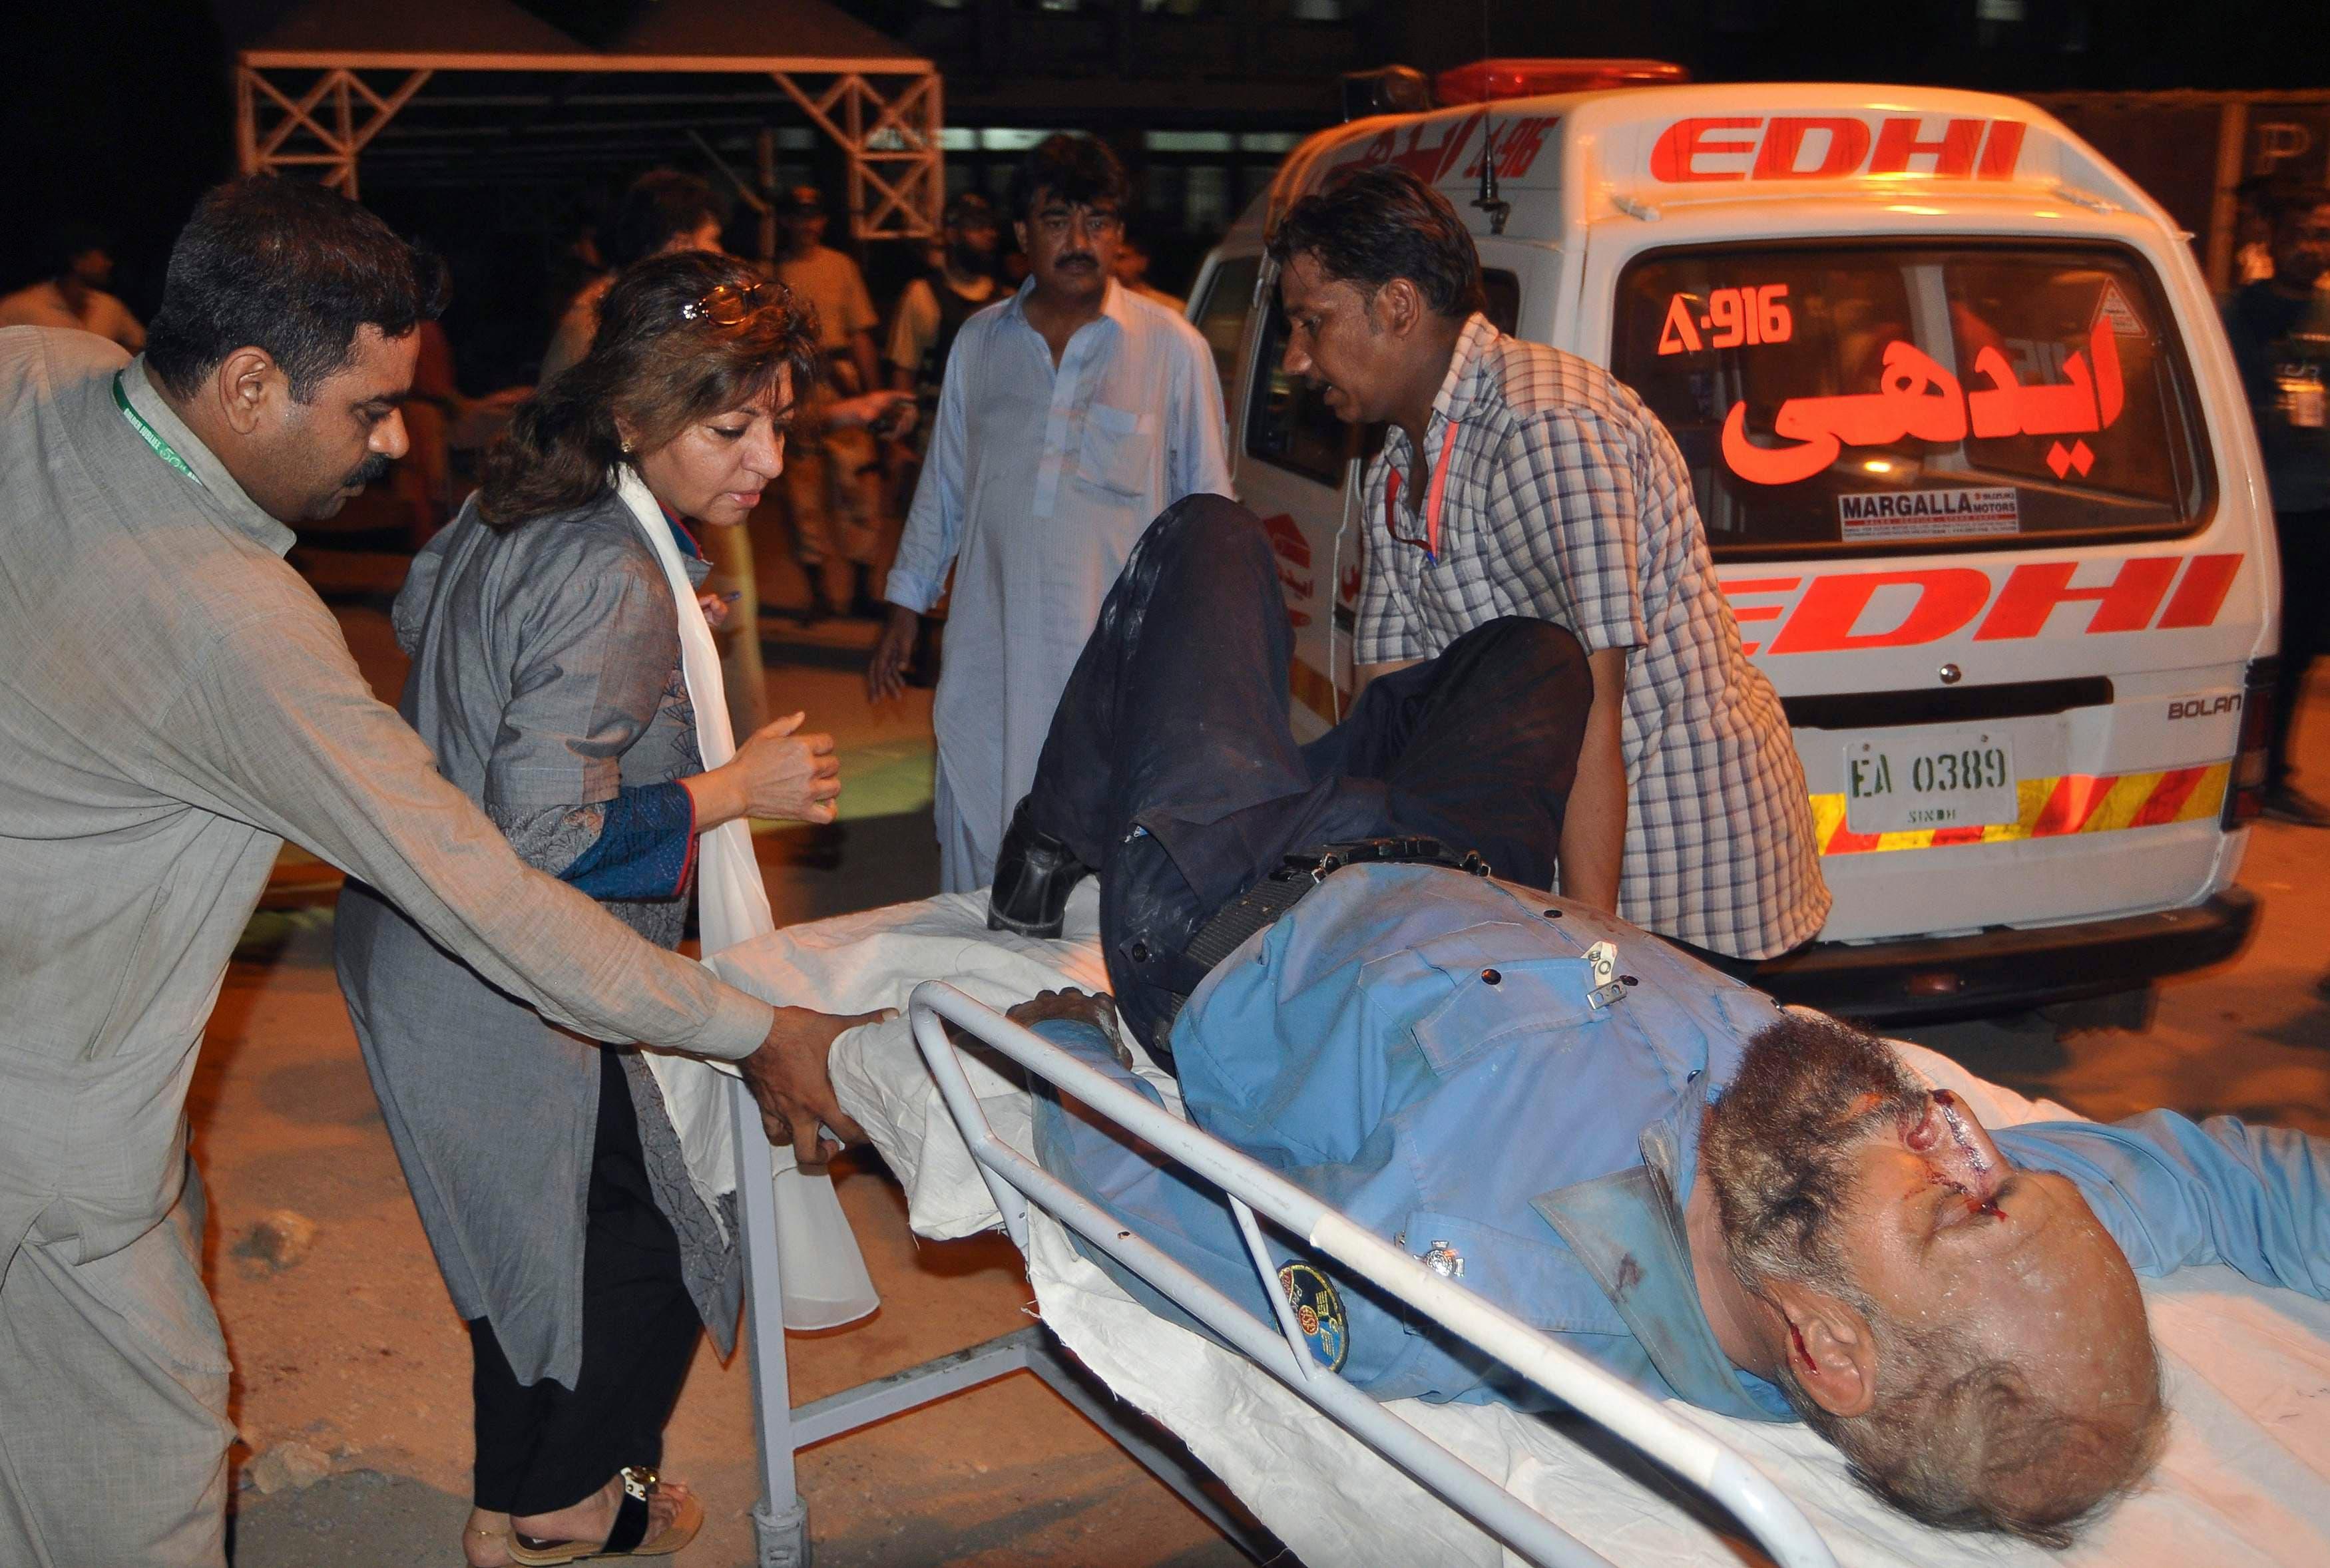 جوم لطالبان على مطار كراتشي3